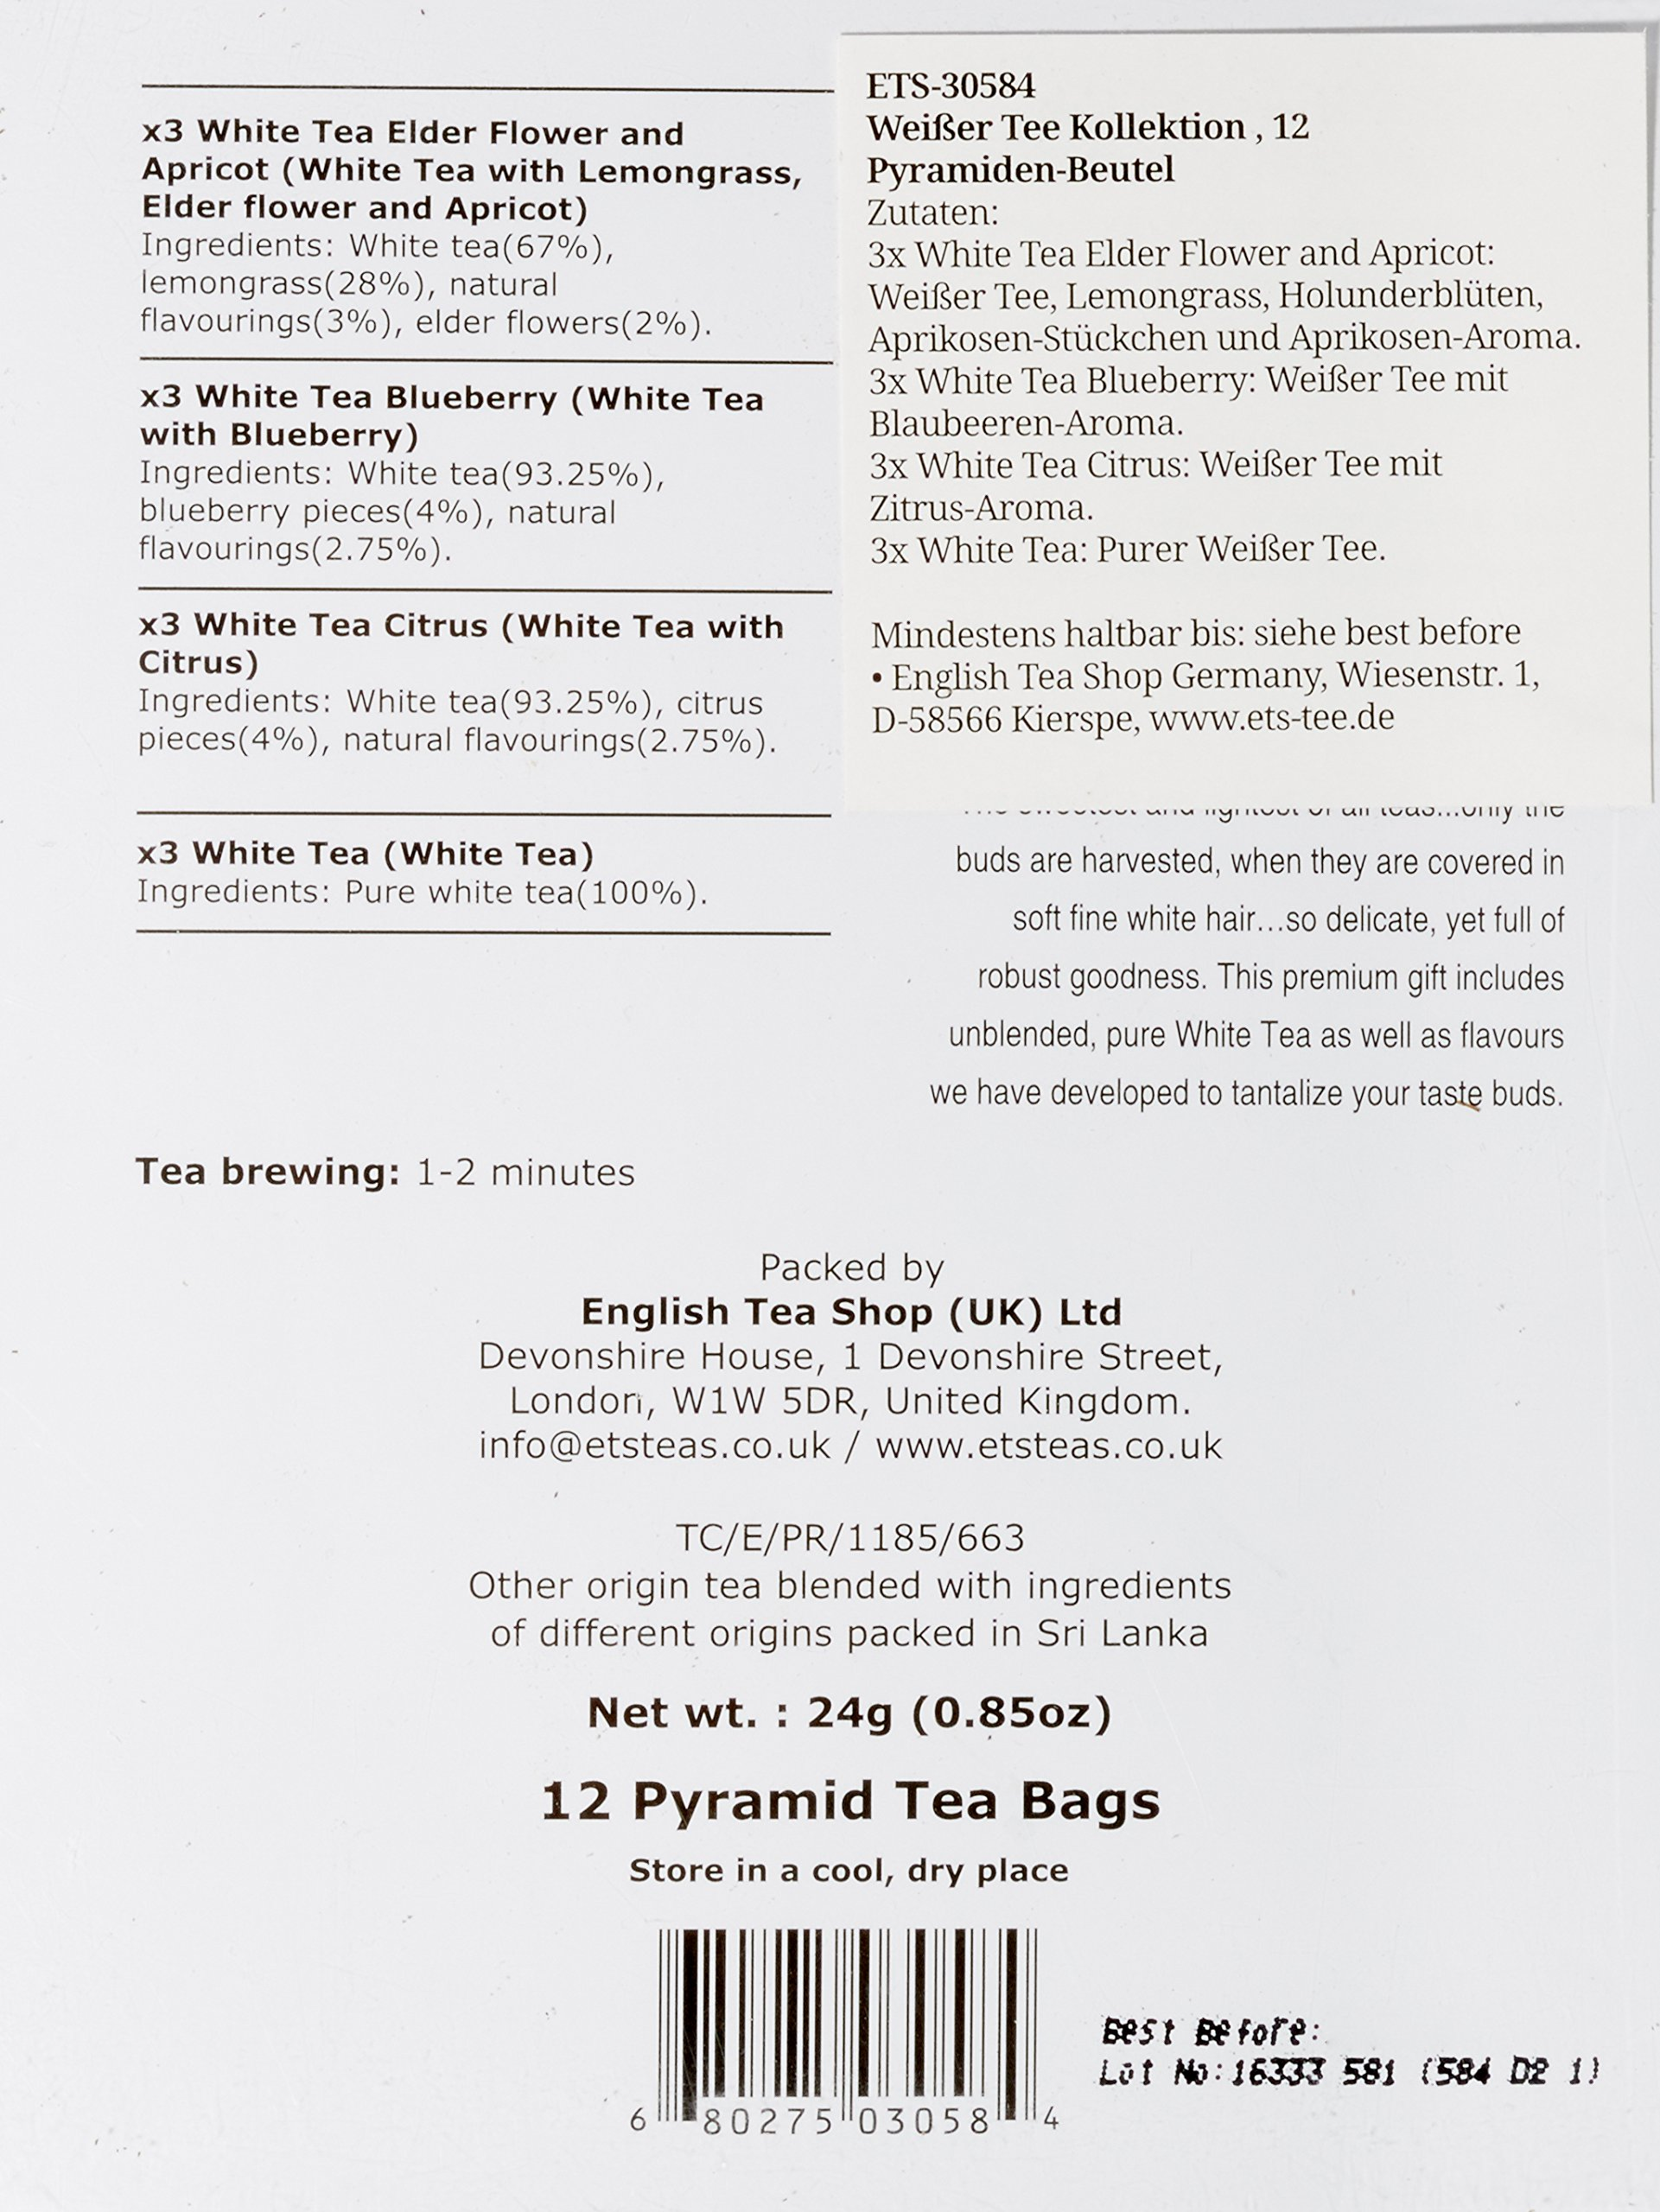 Teegeschenk-Weier-Tee-Kollektion-mit-Schleife-12-Pyramiden-Beutel-4-verschiedenen-Geschmacksrichtungen